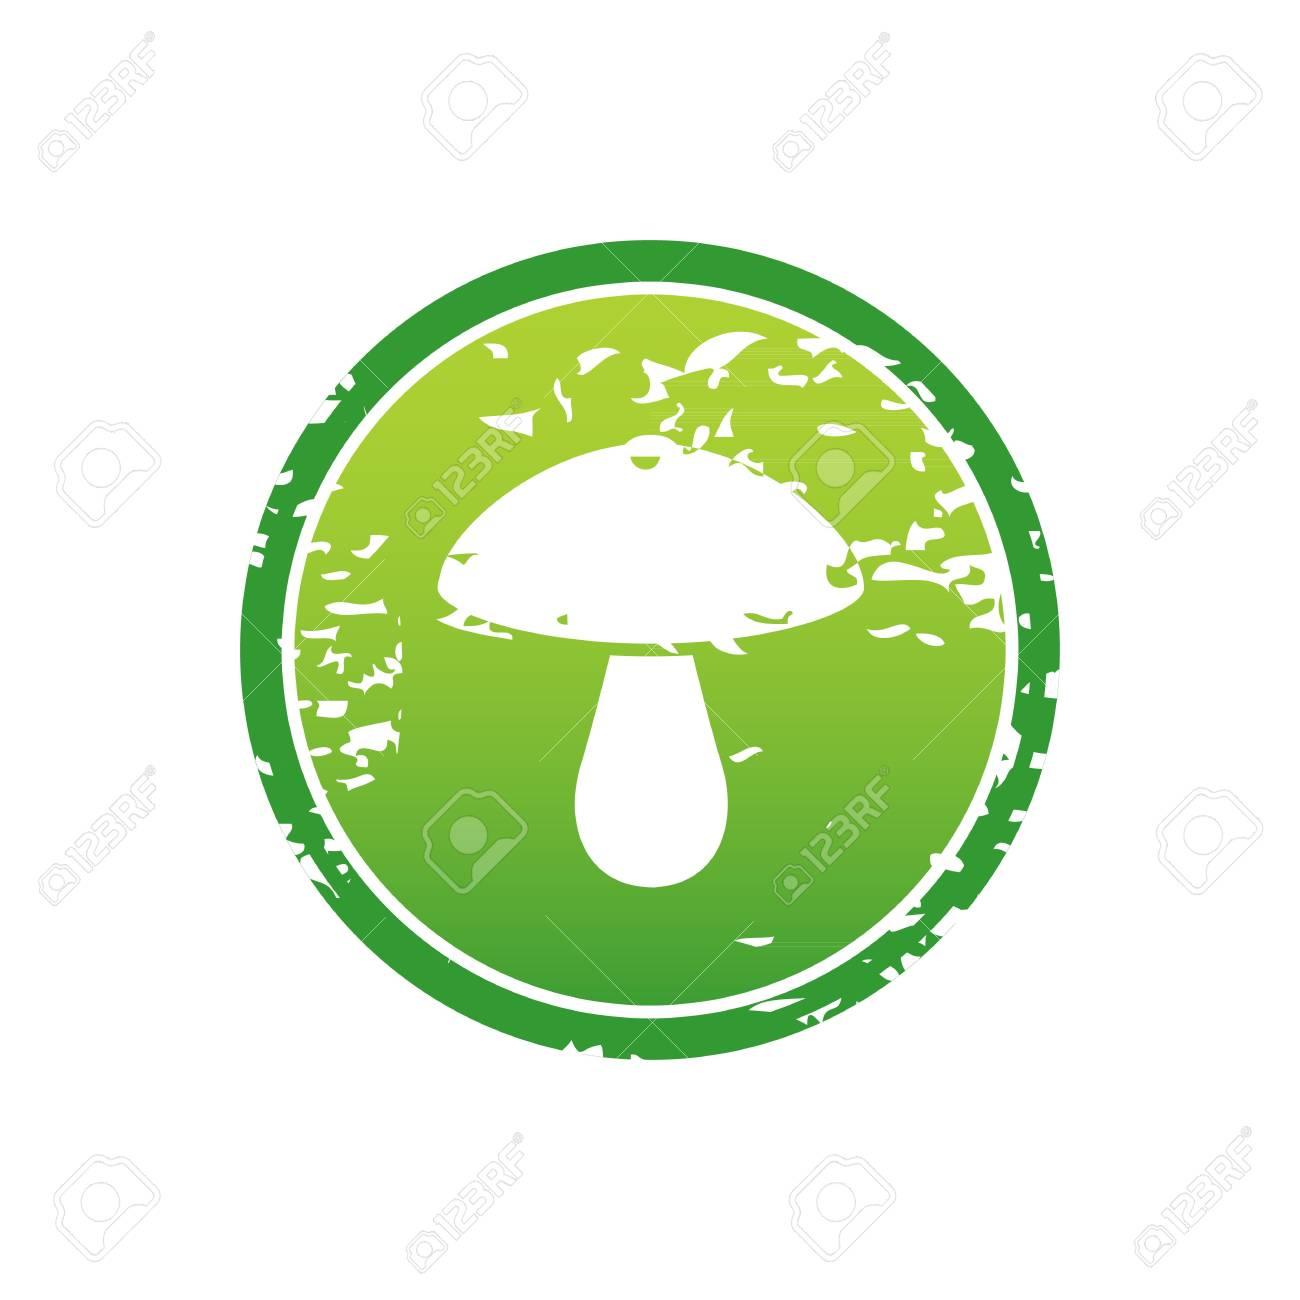 stylish mushroom symbol or template inside green frame illustration